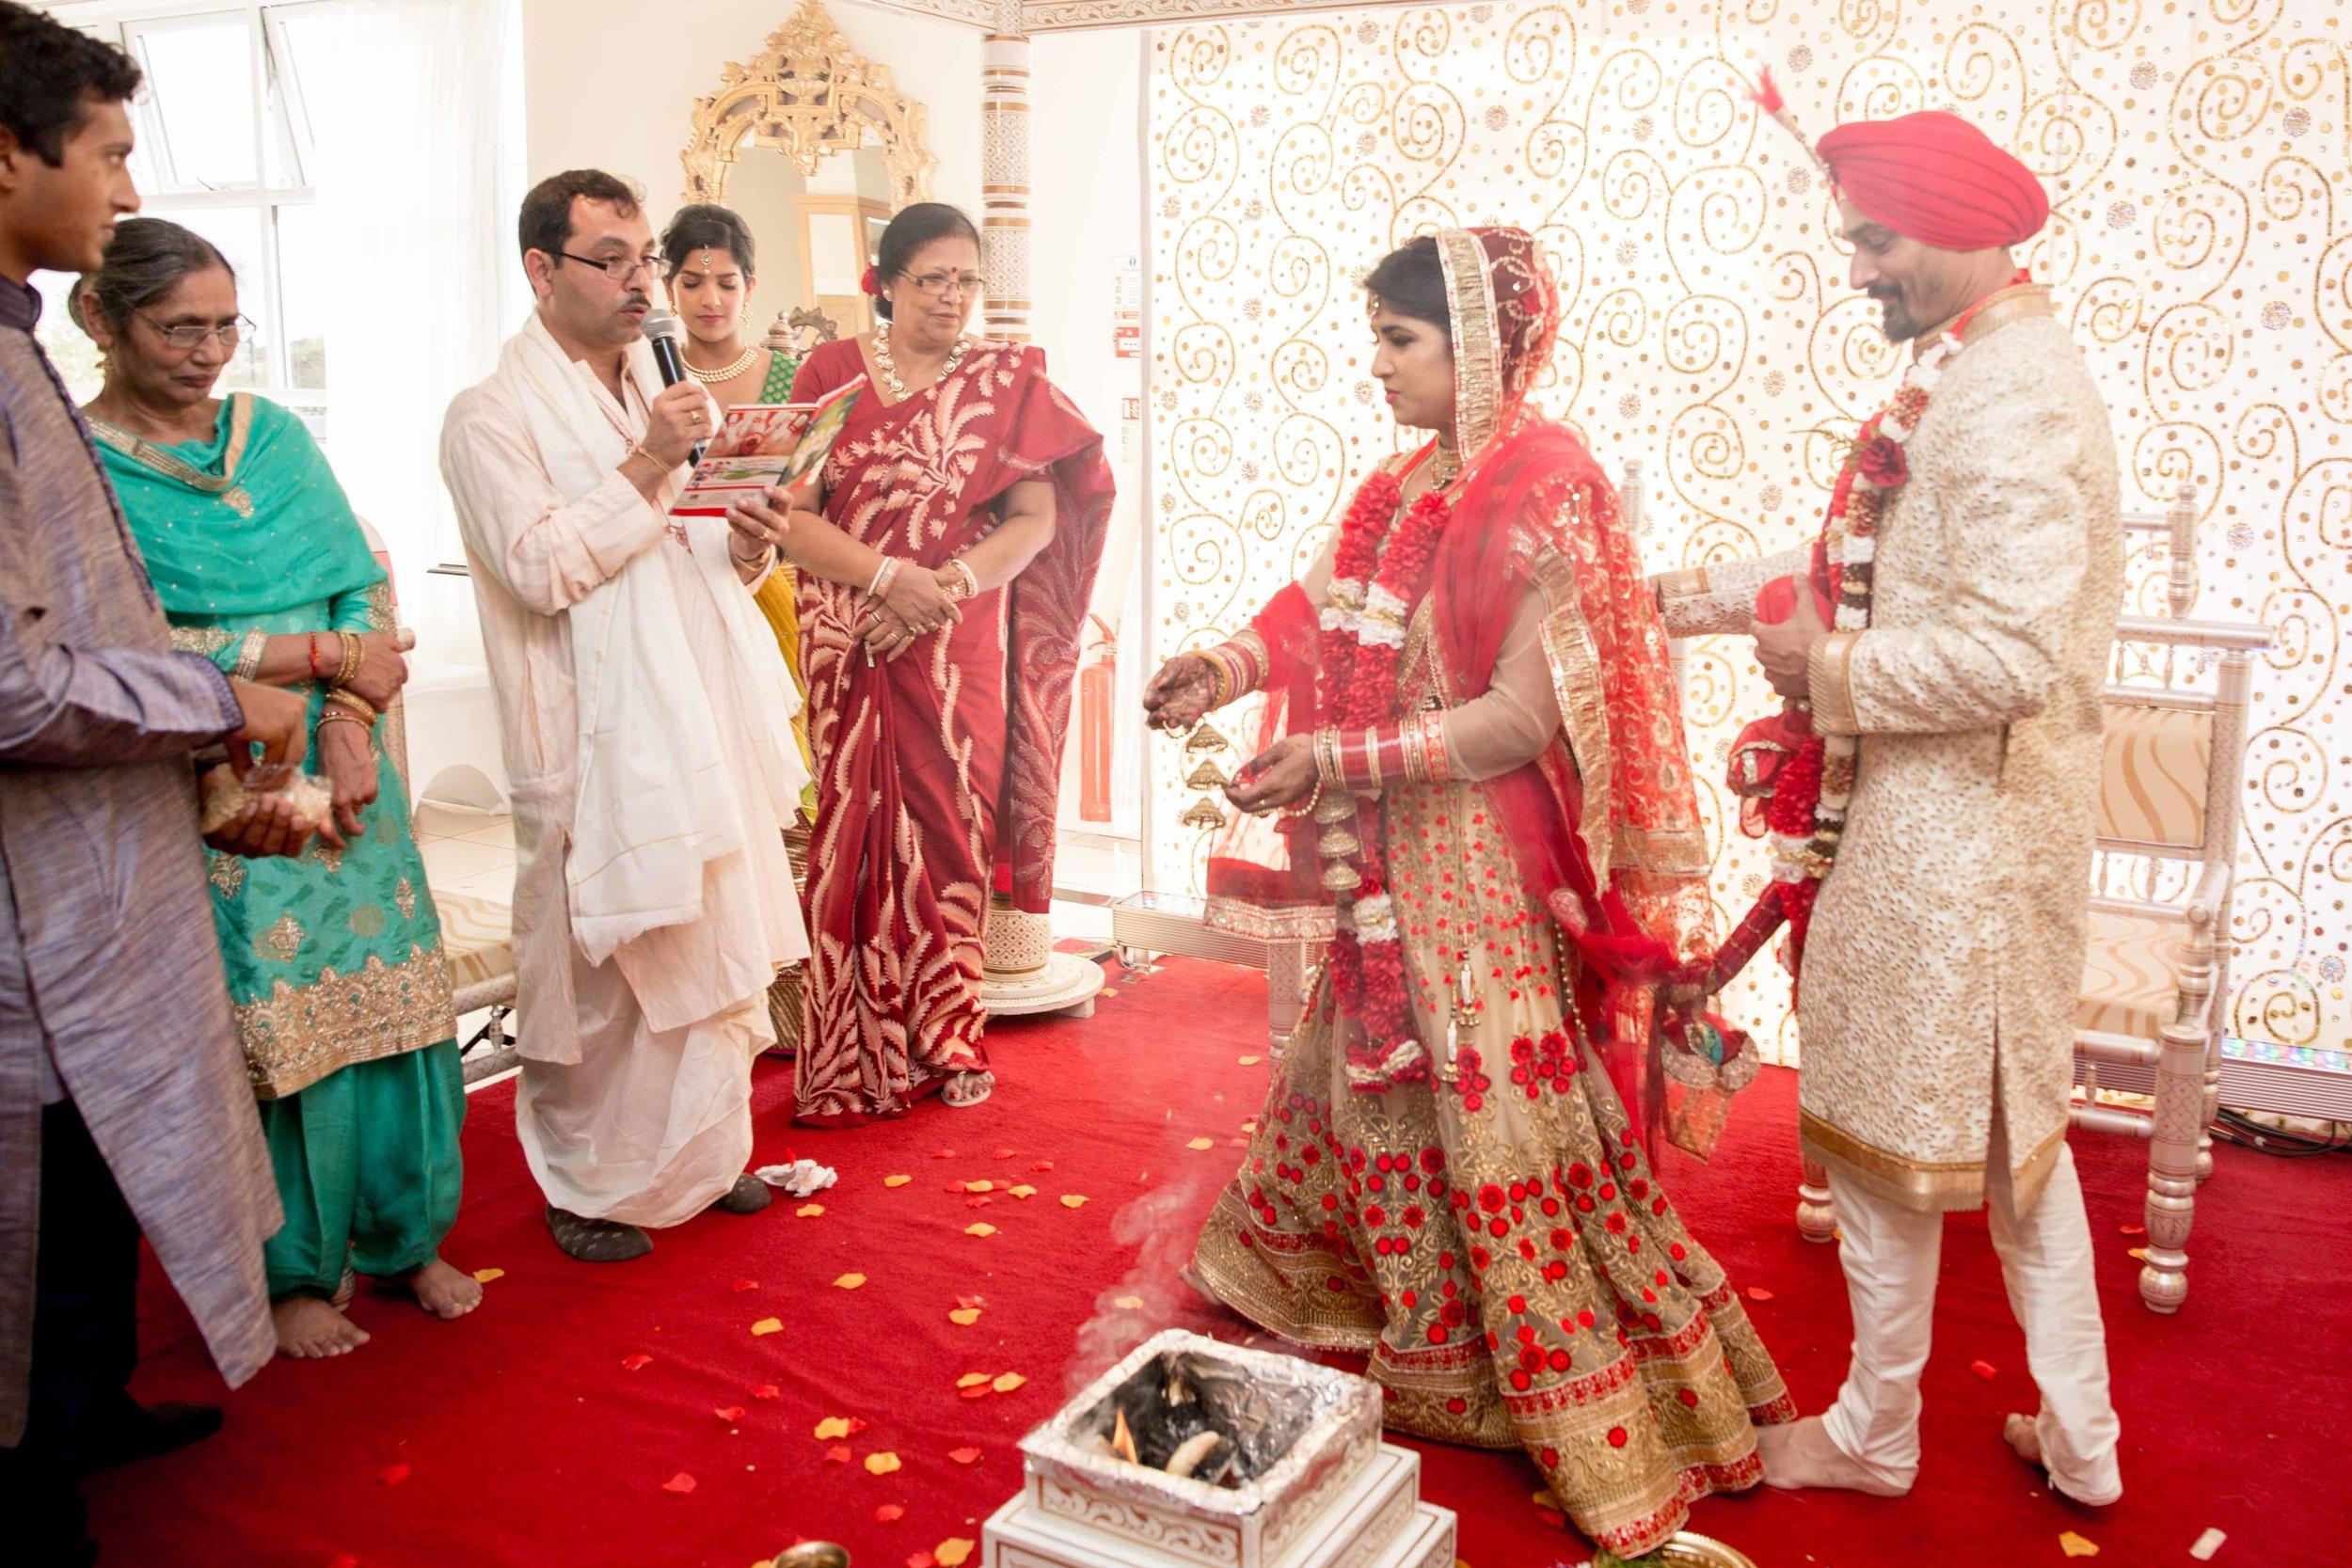 ramada-park-hall-hotel-birmingham-wolverhampton-hindu-wedding-asian-wedding-photography-natalia-smith-photography-25.jpg